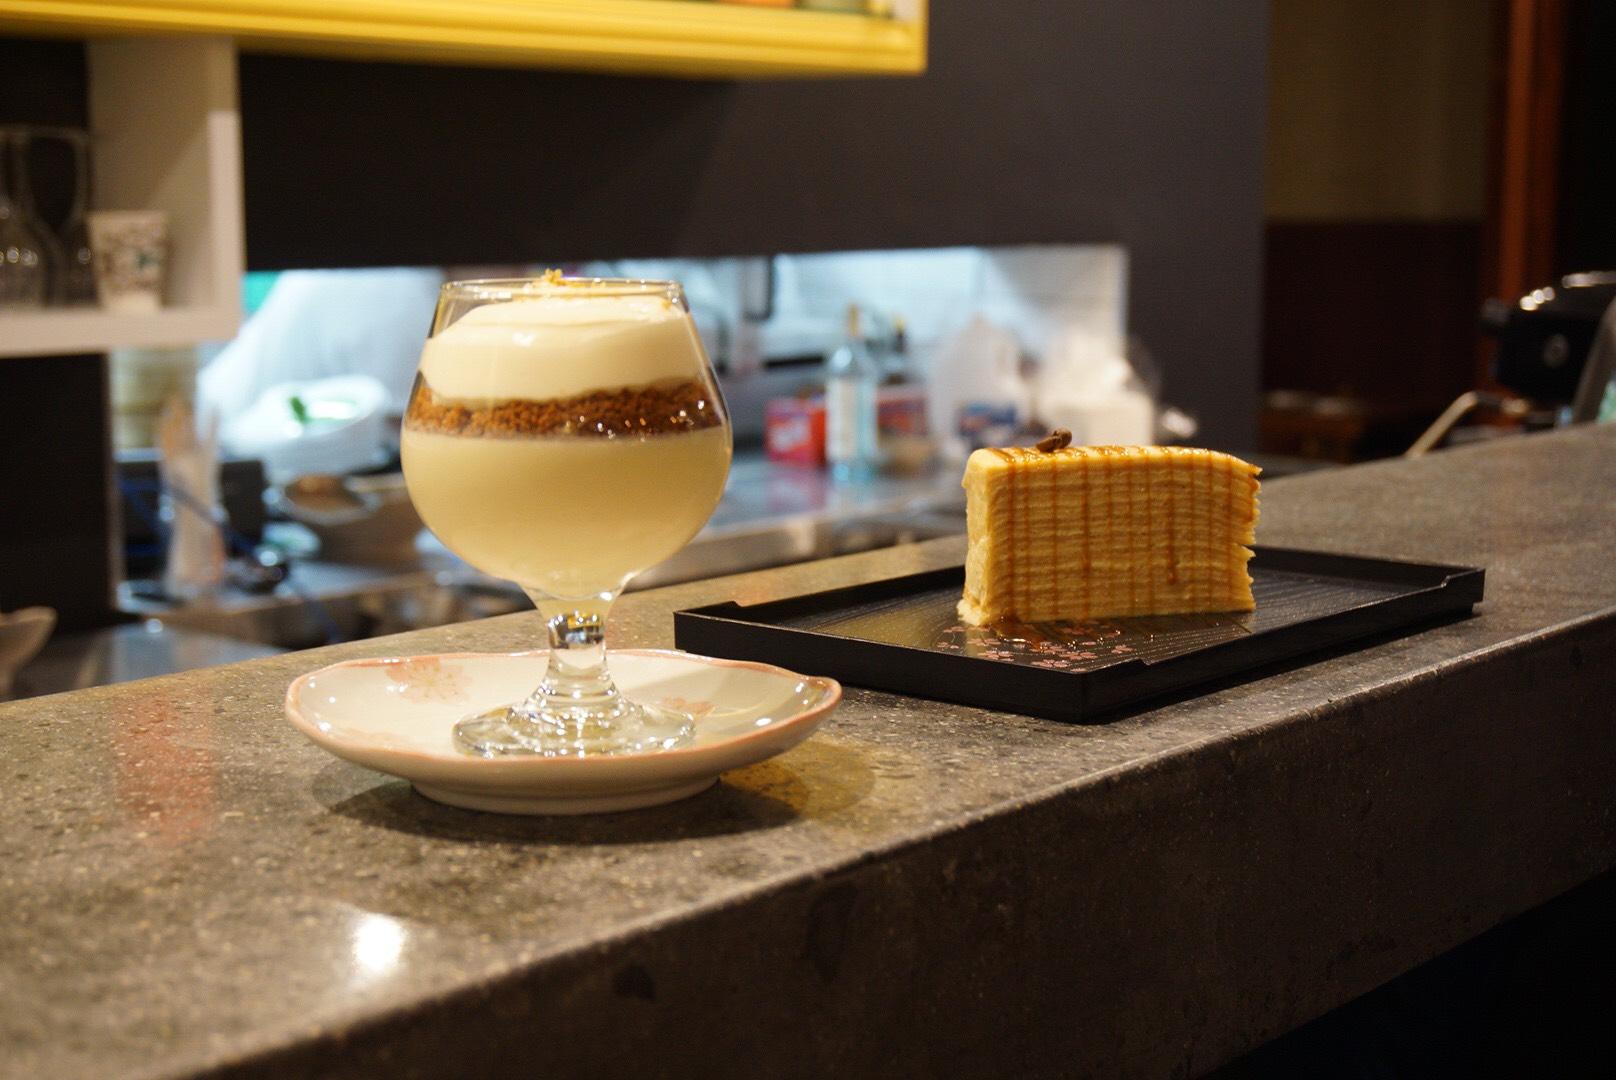 Yuzu Trifle and Caramel Macchiato Crepe Cake